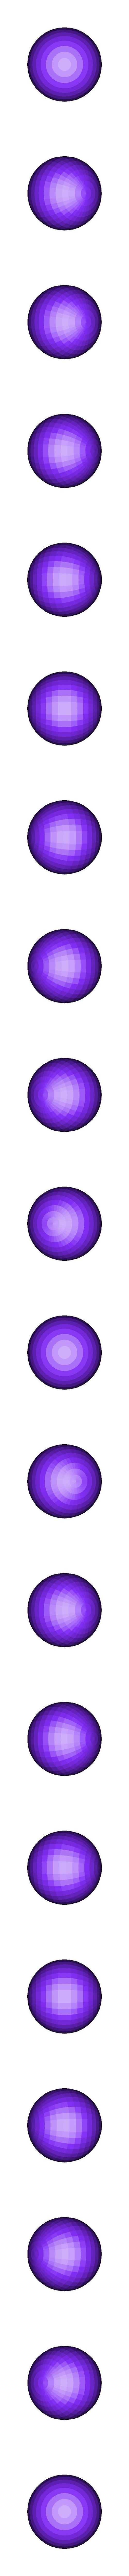 sphere.stl Download free STL file geometric shapes • 3D print object, seppemachielsen